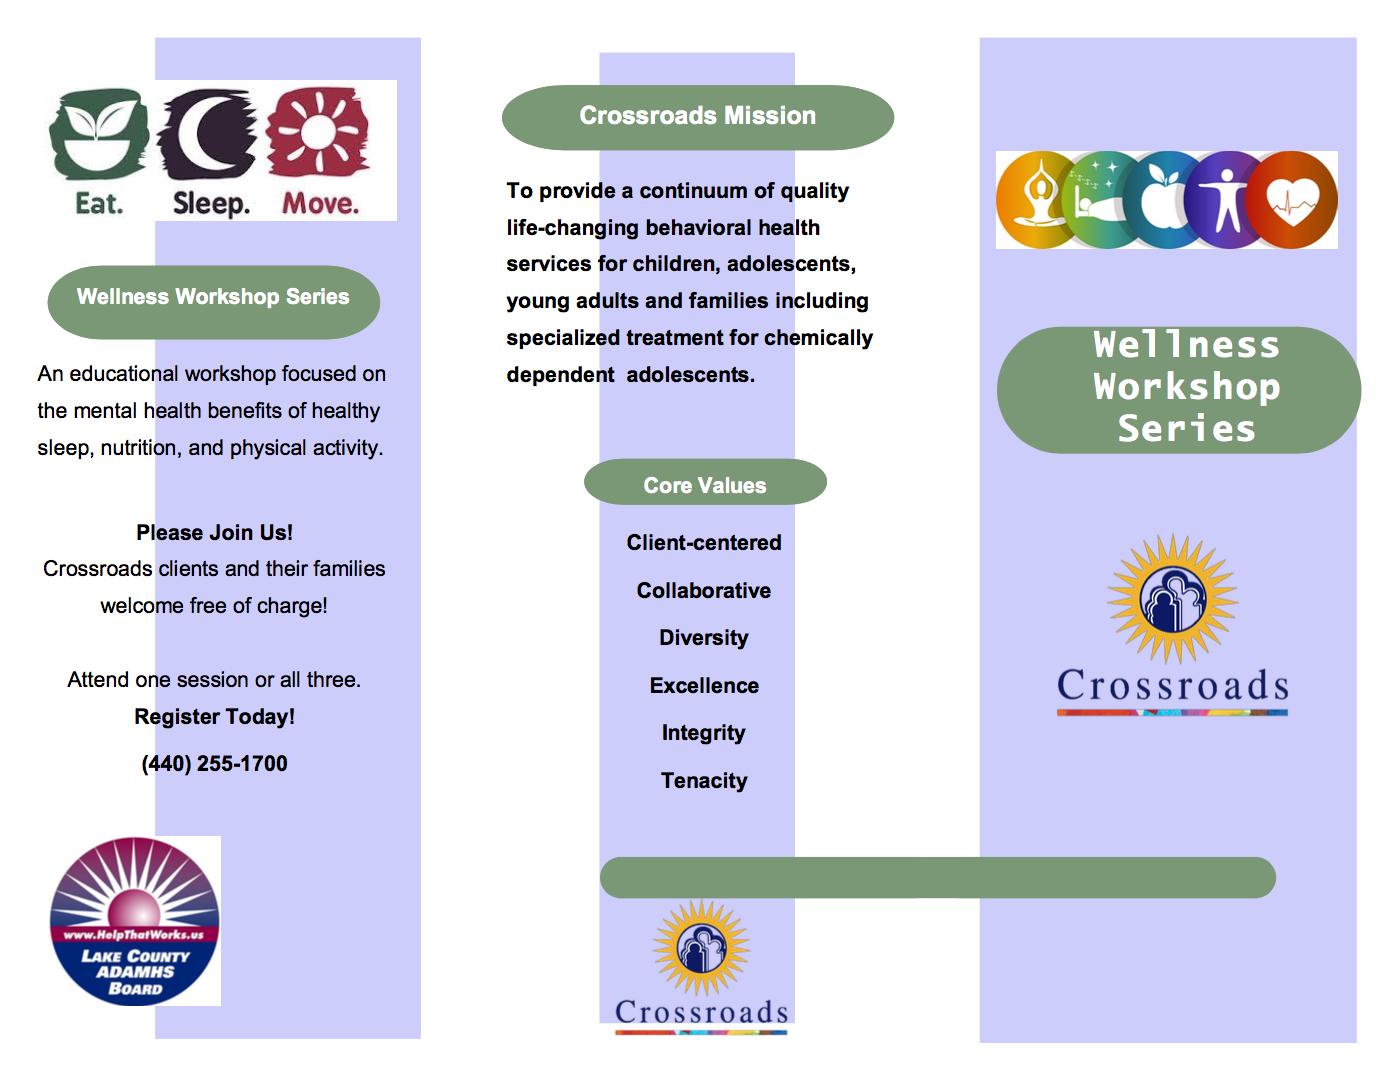 Crossroads' Wellness Workshop Series